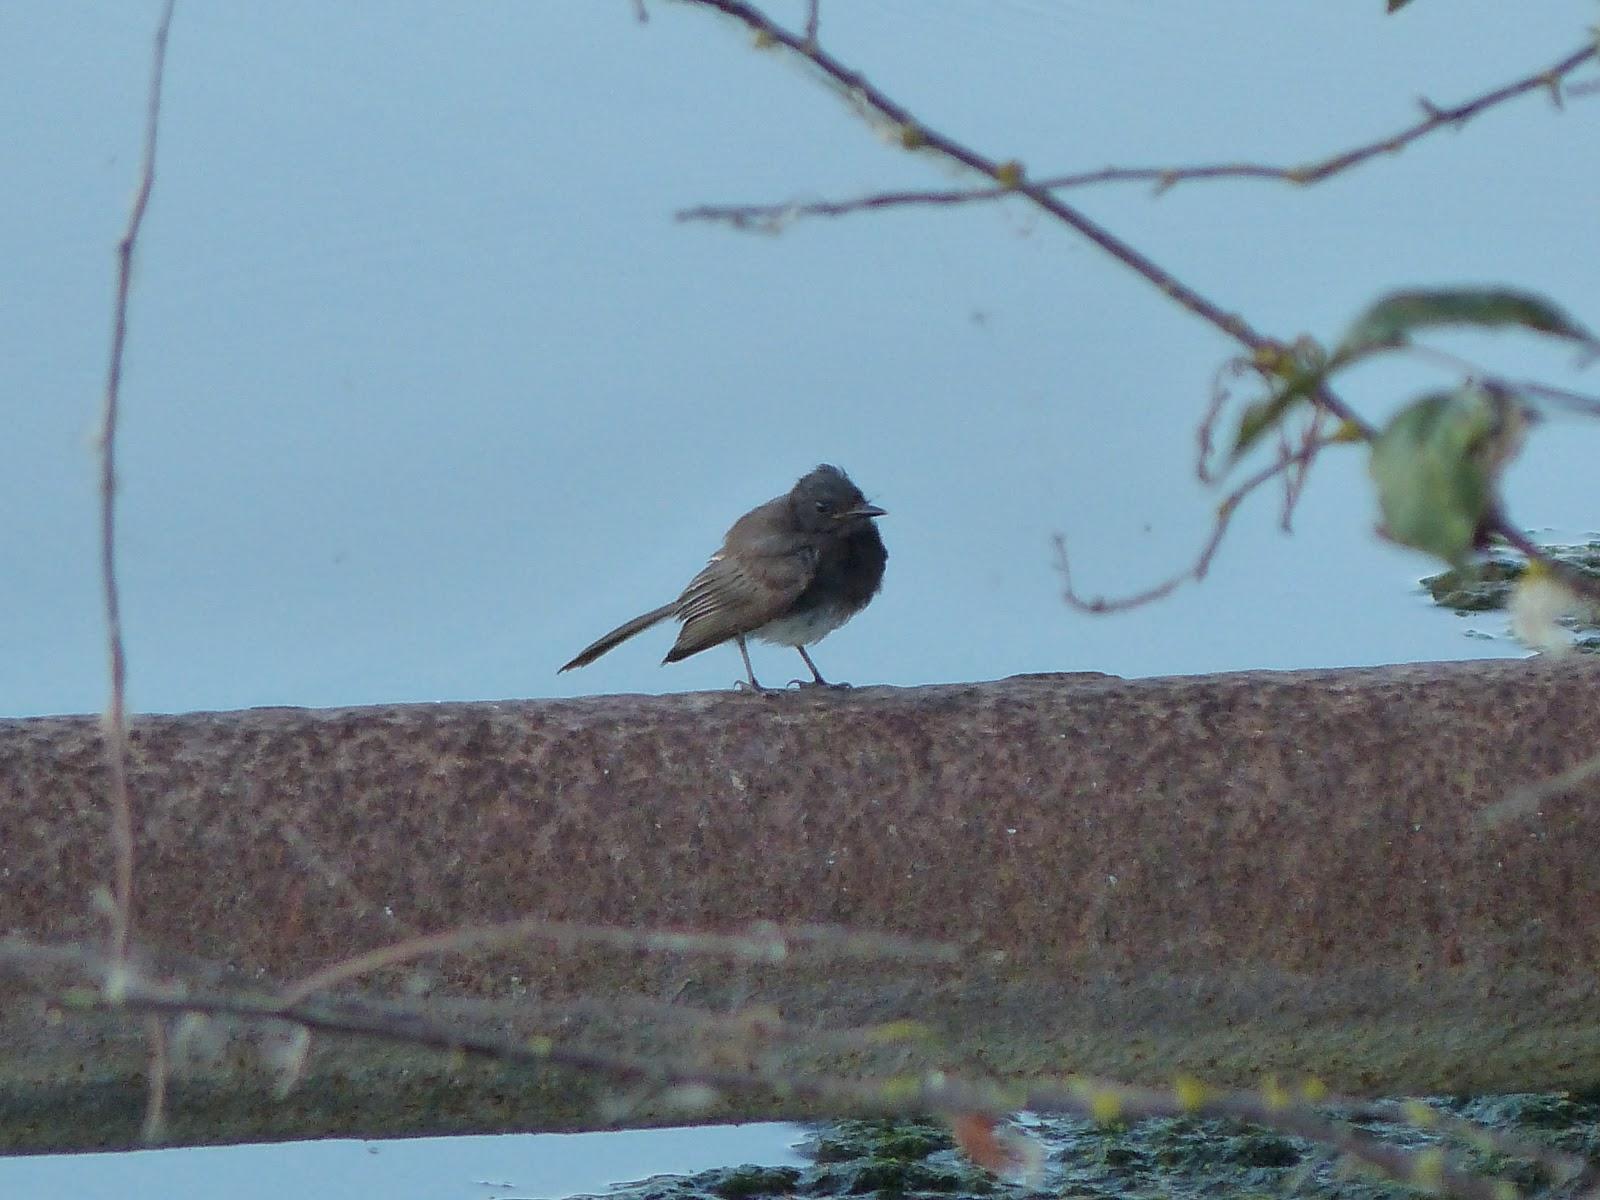 Bc Rare Bird Alert Rba Black Phoebe In Delta Aug 29 30th